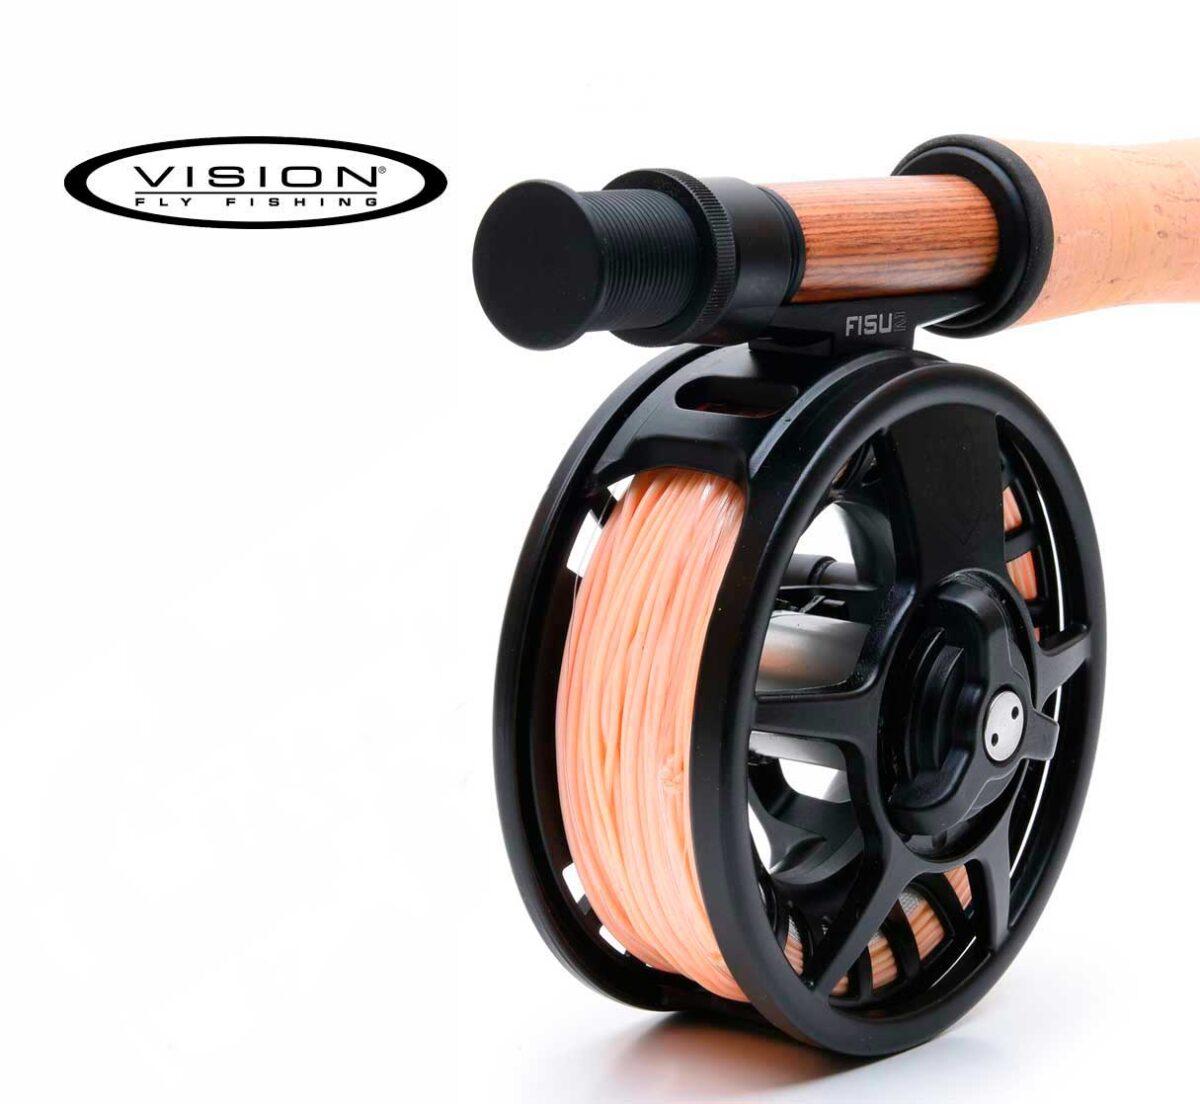 Kit Pesca Mosca Vision Fisu 2